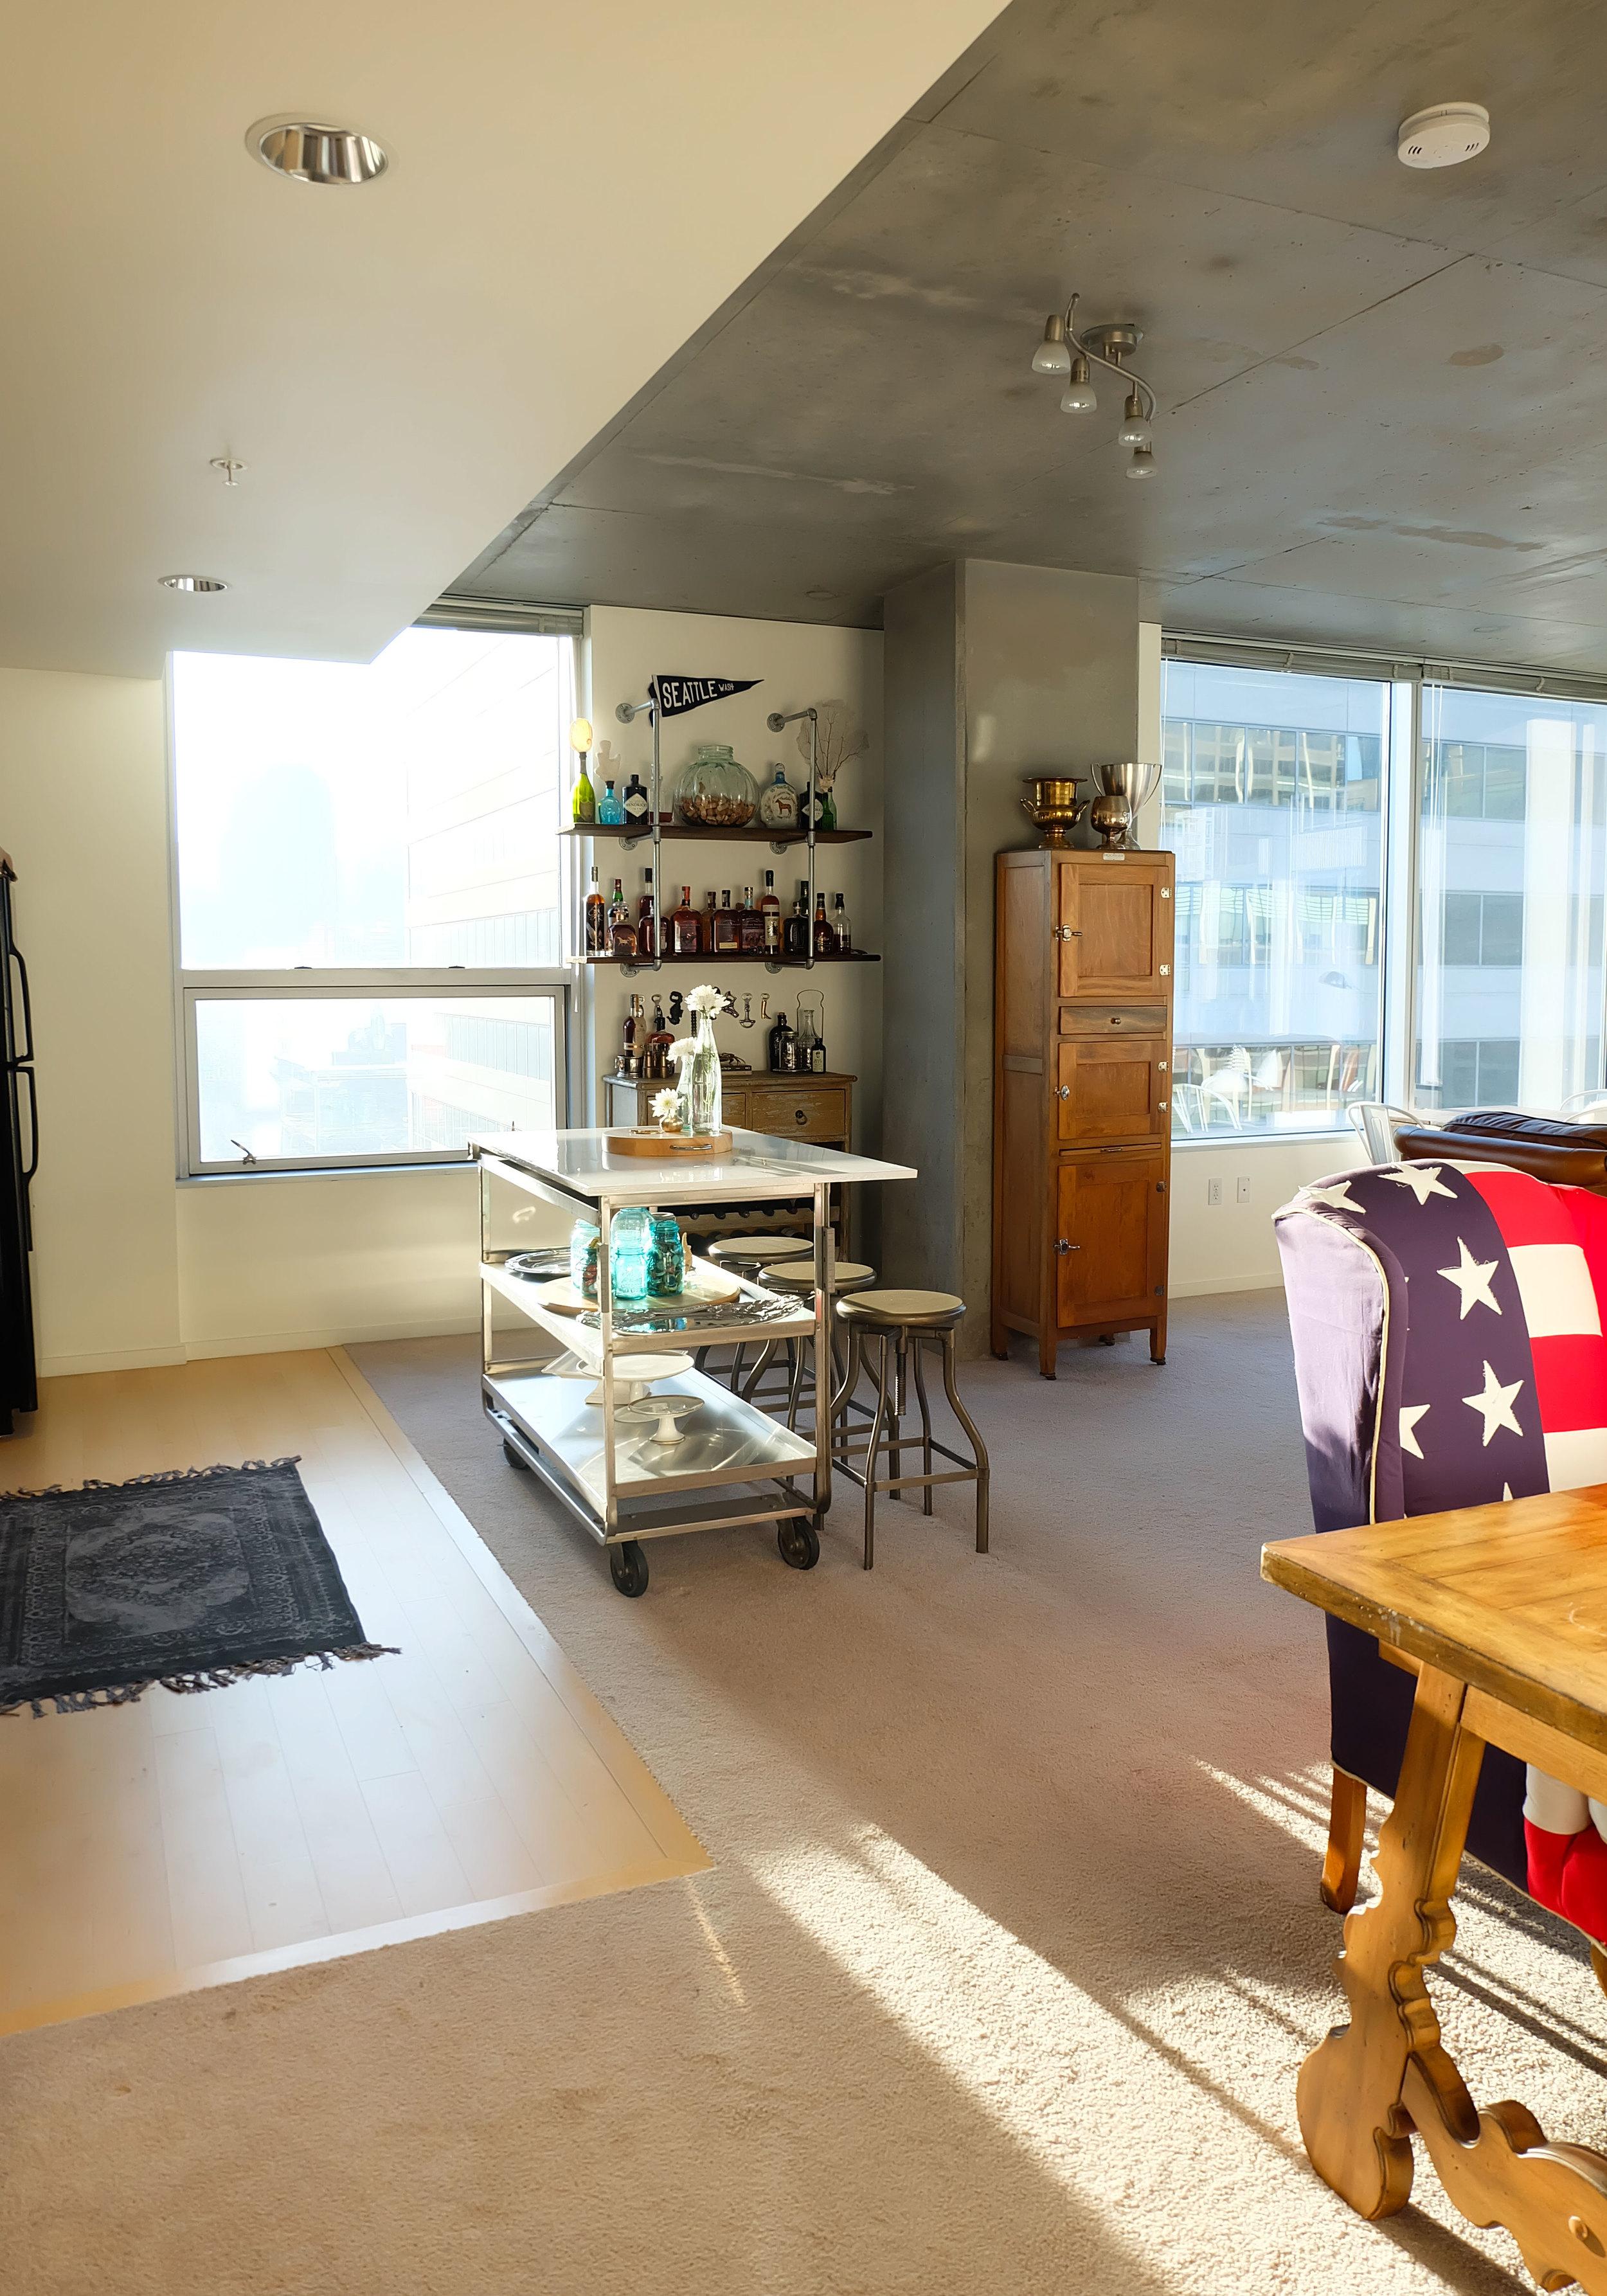 DIY Faux Carrara Marble Countertop, DIY Kitchen Island Cart, Industrial Loft in Seattle, DIY Bar, American Flag Queen Anne Chair